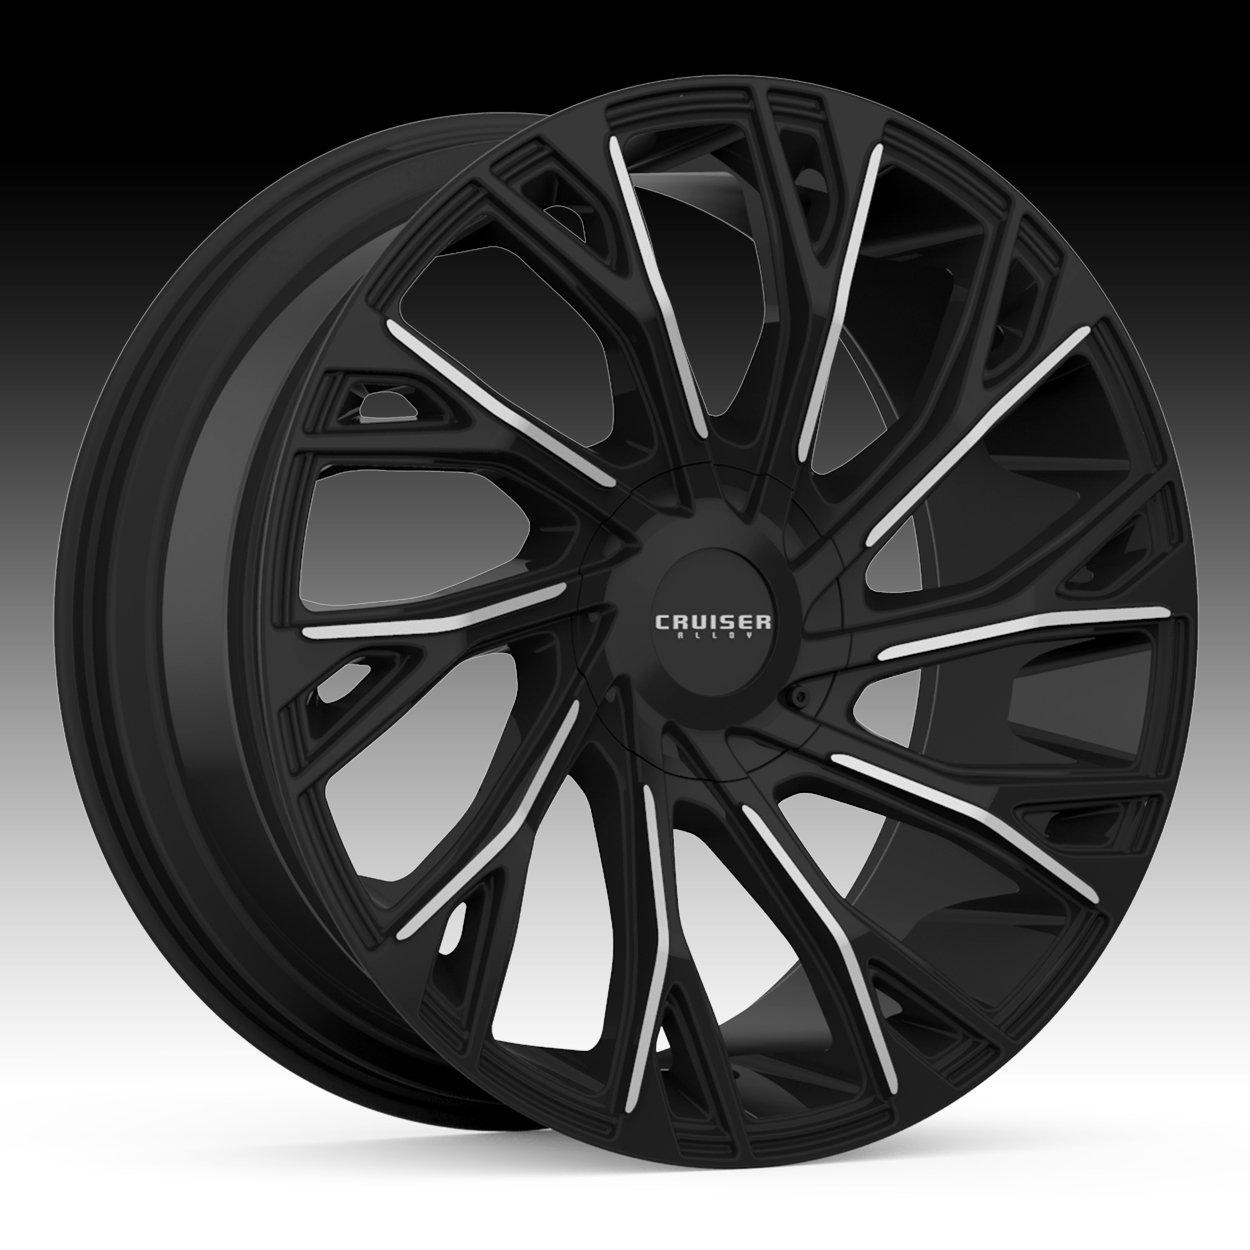 Cruiser Alloy 925MB Cutter 22x9.5 5x115/5x139.7 +15mm Black/Machined Wheel Rim